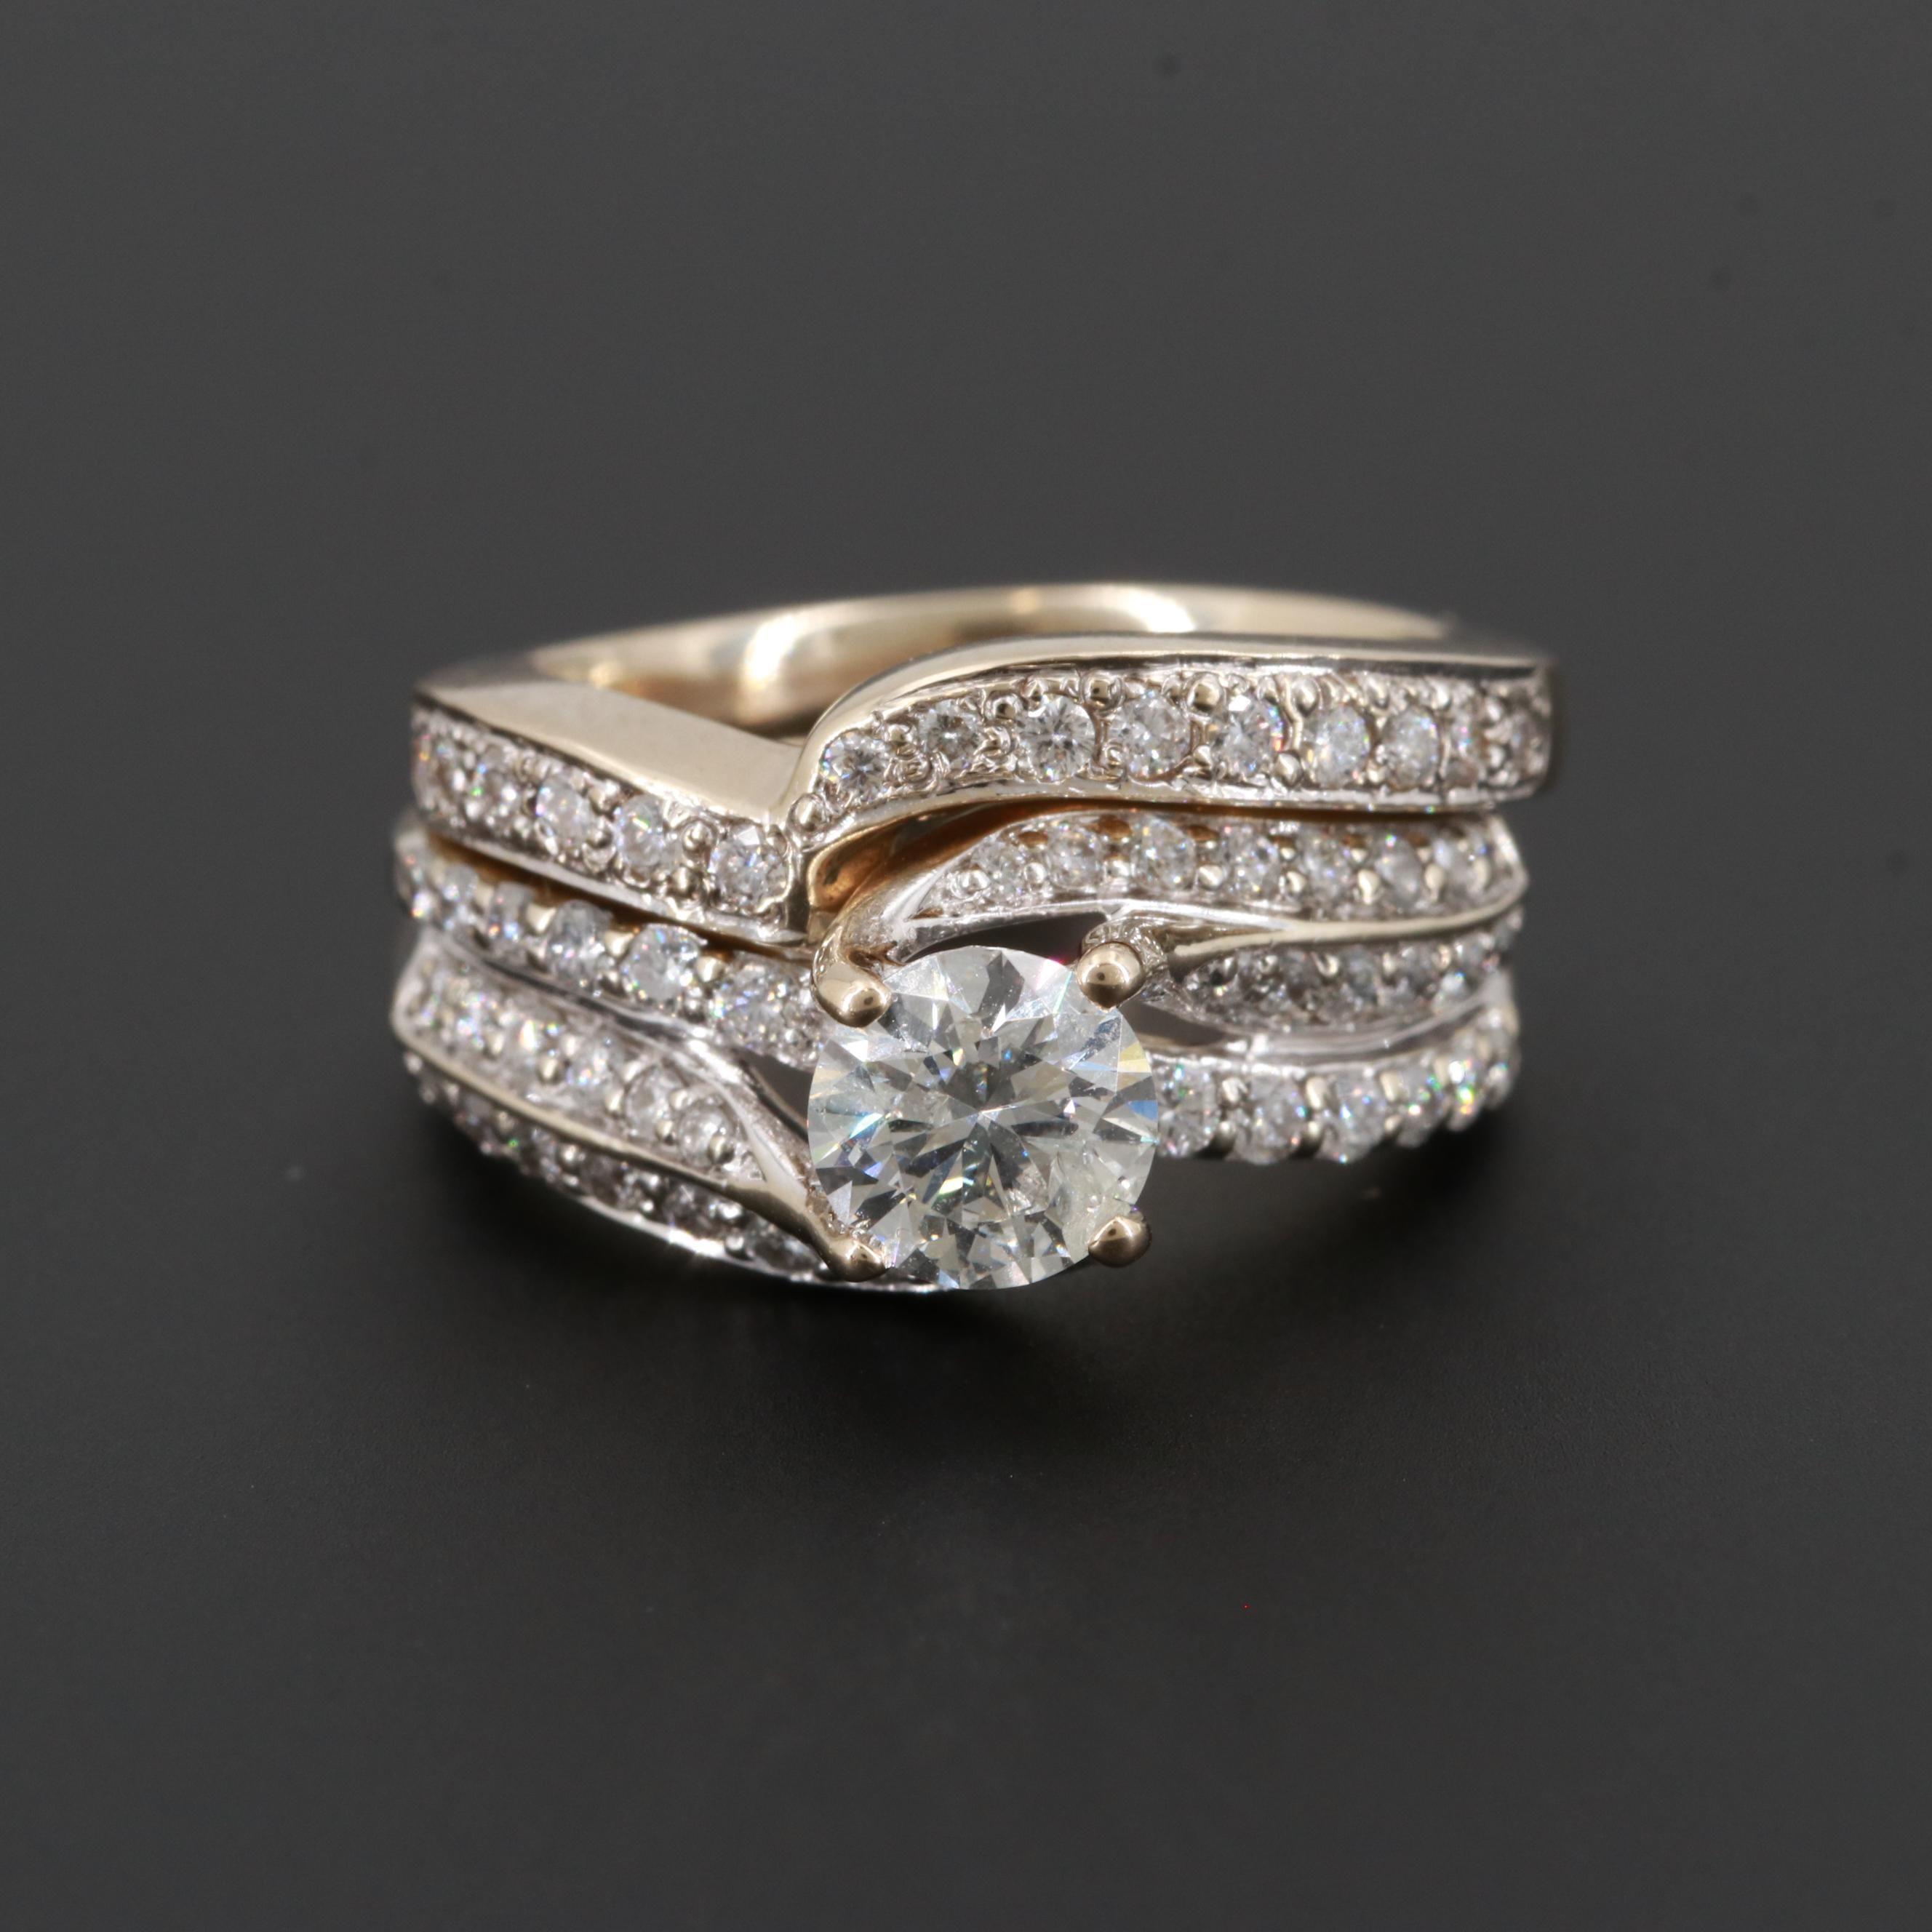 18K White Gold 1.43 CTW Diamond Ring Set